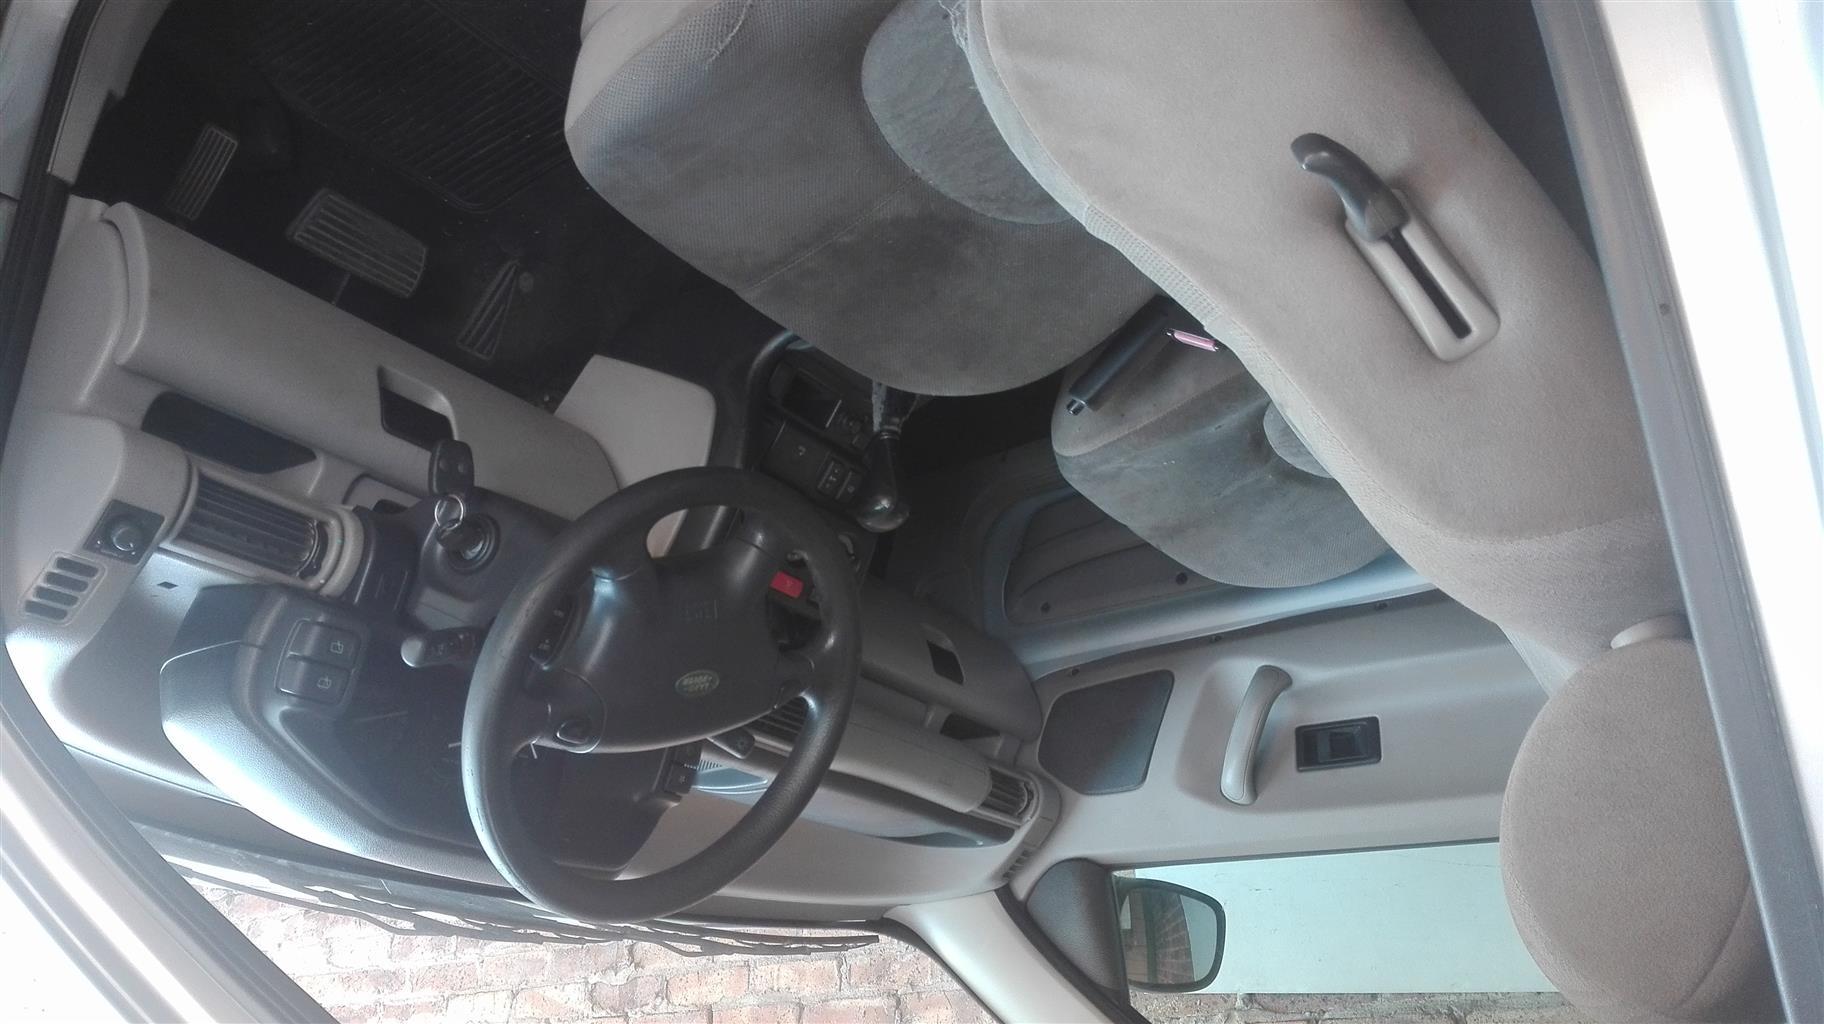 2003 Land Rover Freelander 2.0 Td4 3 door SE